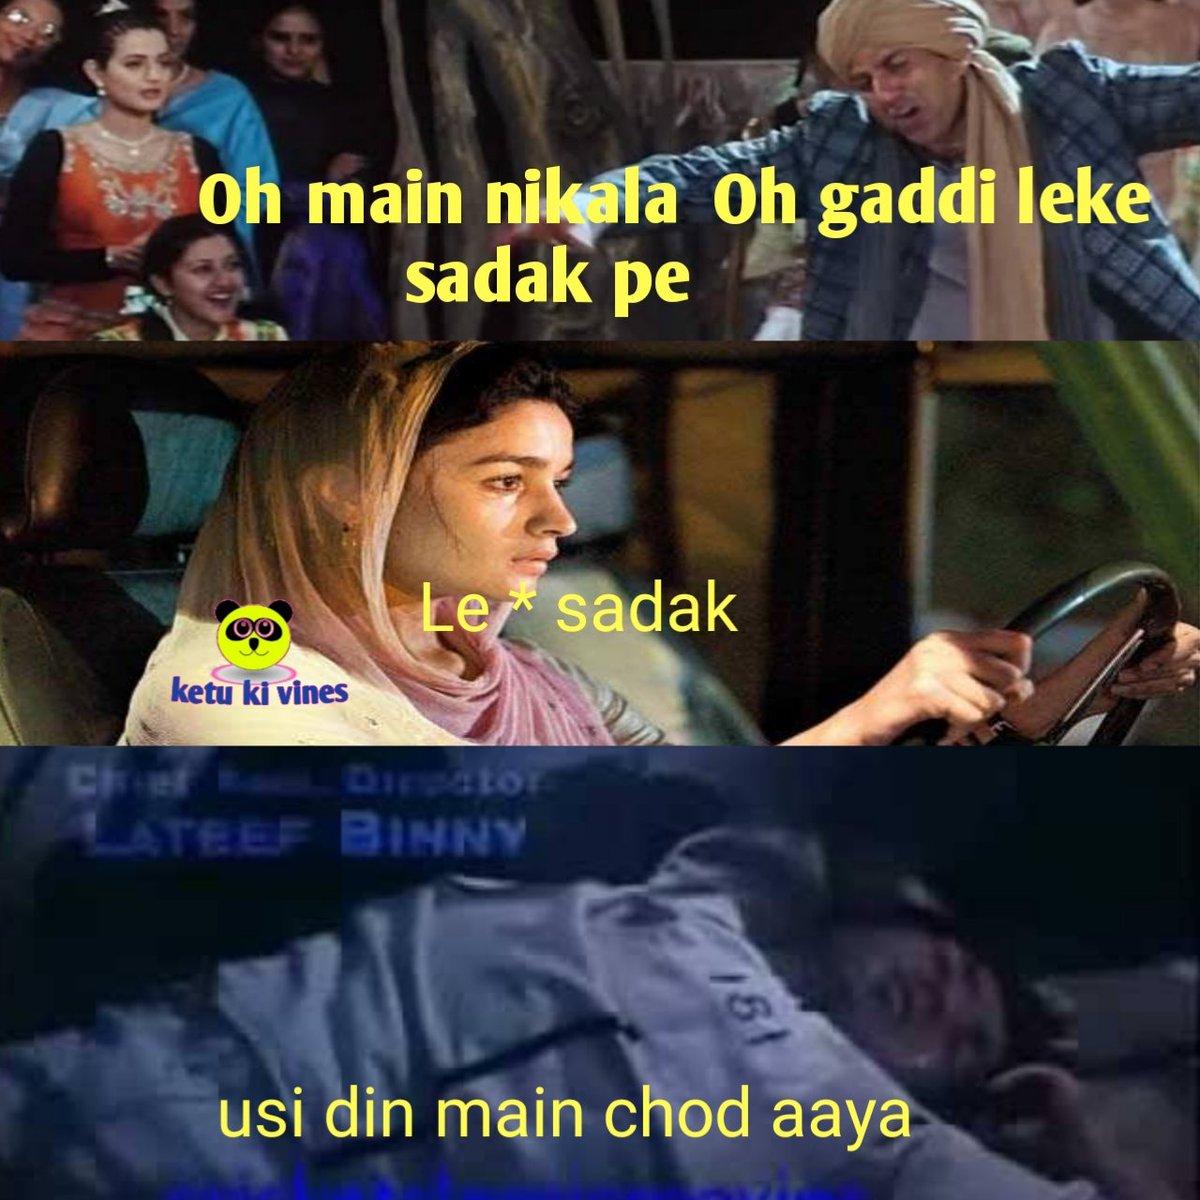 #sadak carryminati #indianjokes #adultmemes #laughingcolours #hindimemes #ashishchanchlani #bhuvanbam #bcbilli #desimemes #bollywoodmemes #rvcjinsta #sakhtlaunda #hindijokes #chutiyapa #lockdownqueen#adultsociety #naughtyworld #bakchodi  #be haraami https://t.co/THYqbl10Qm